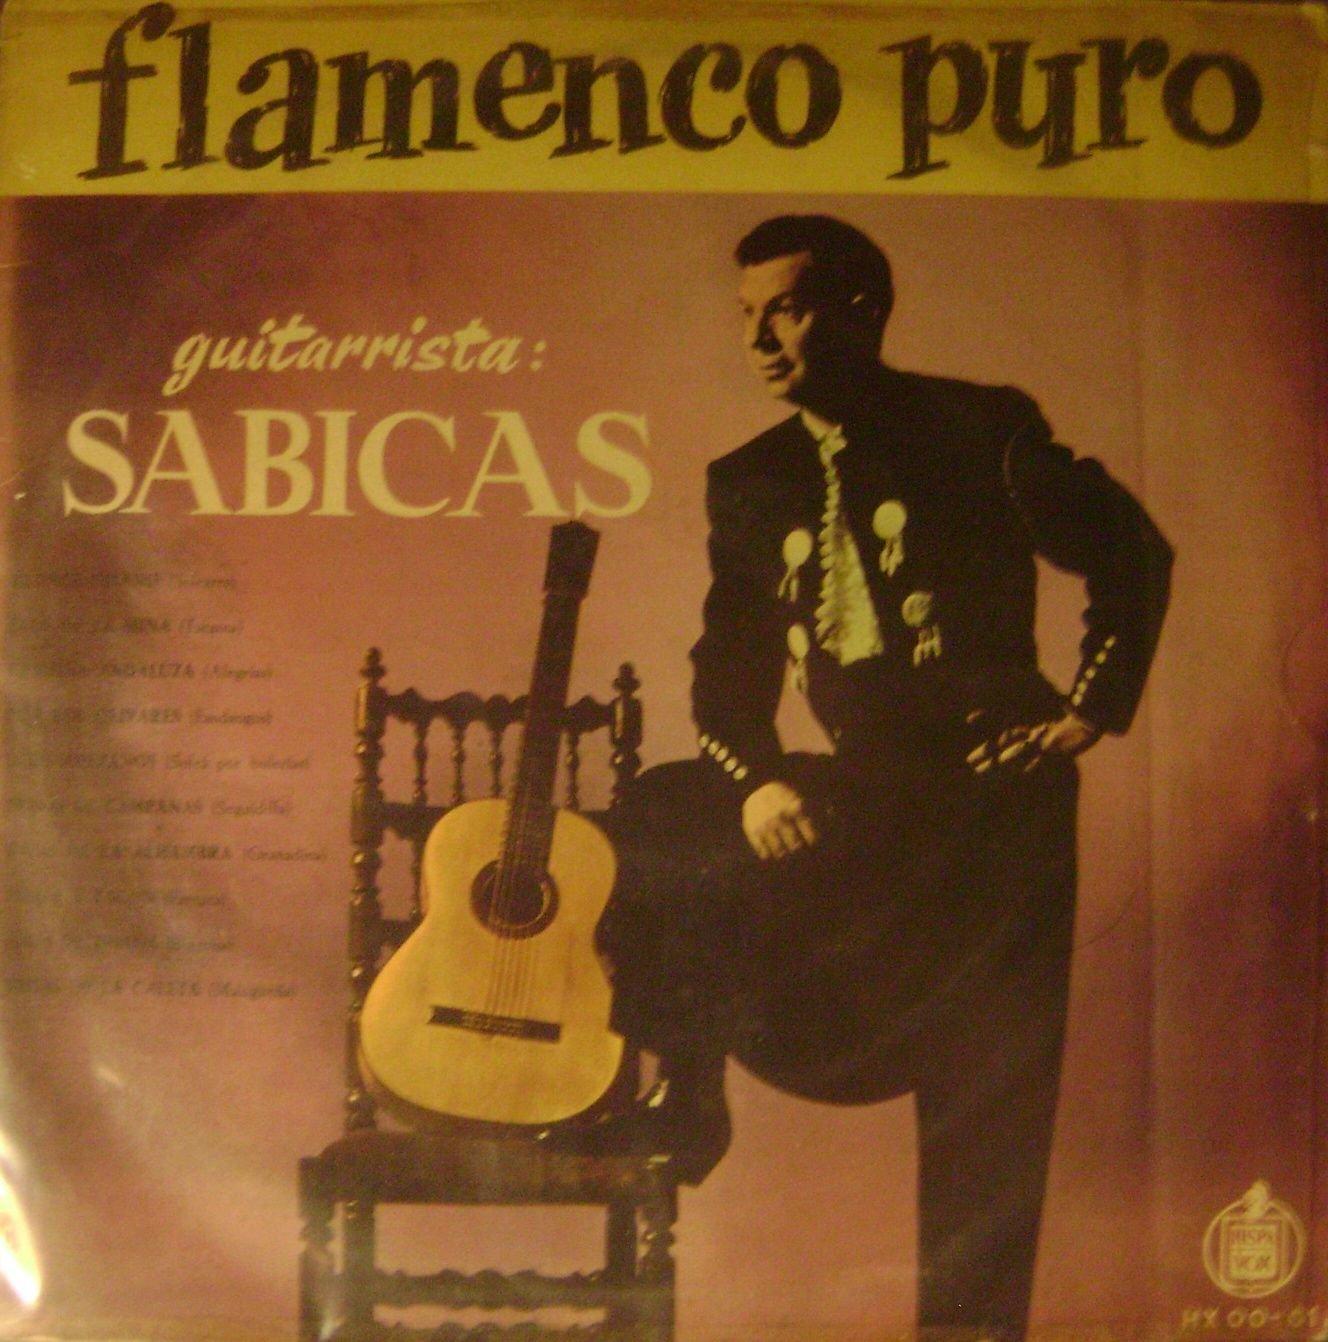 Guitarrista Sabicas, Flamenco Puro LP: SABICAS & CARMEN AMAYA ...